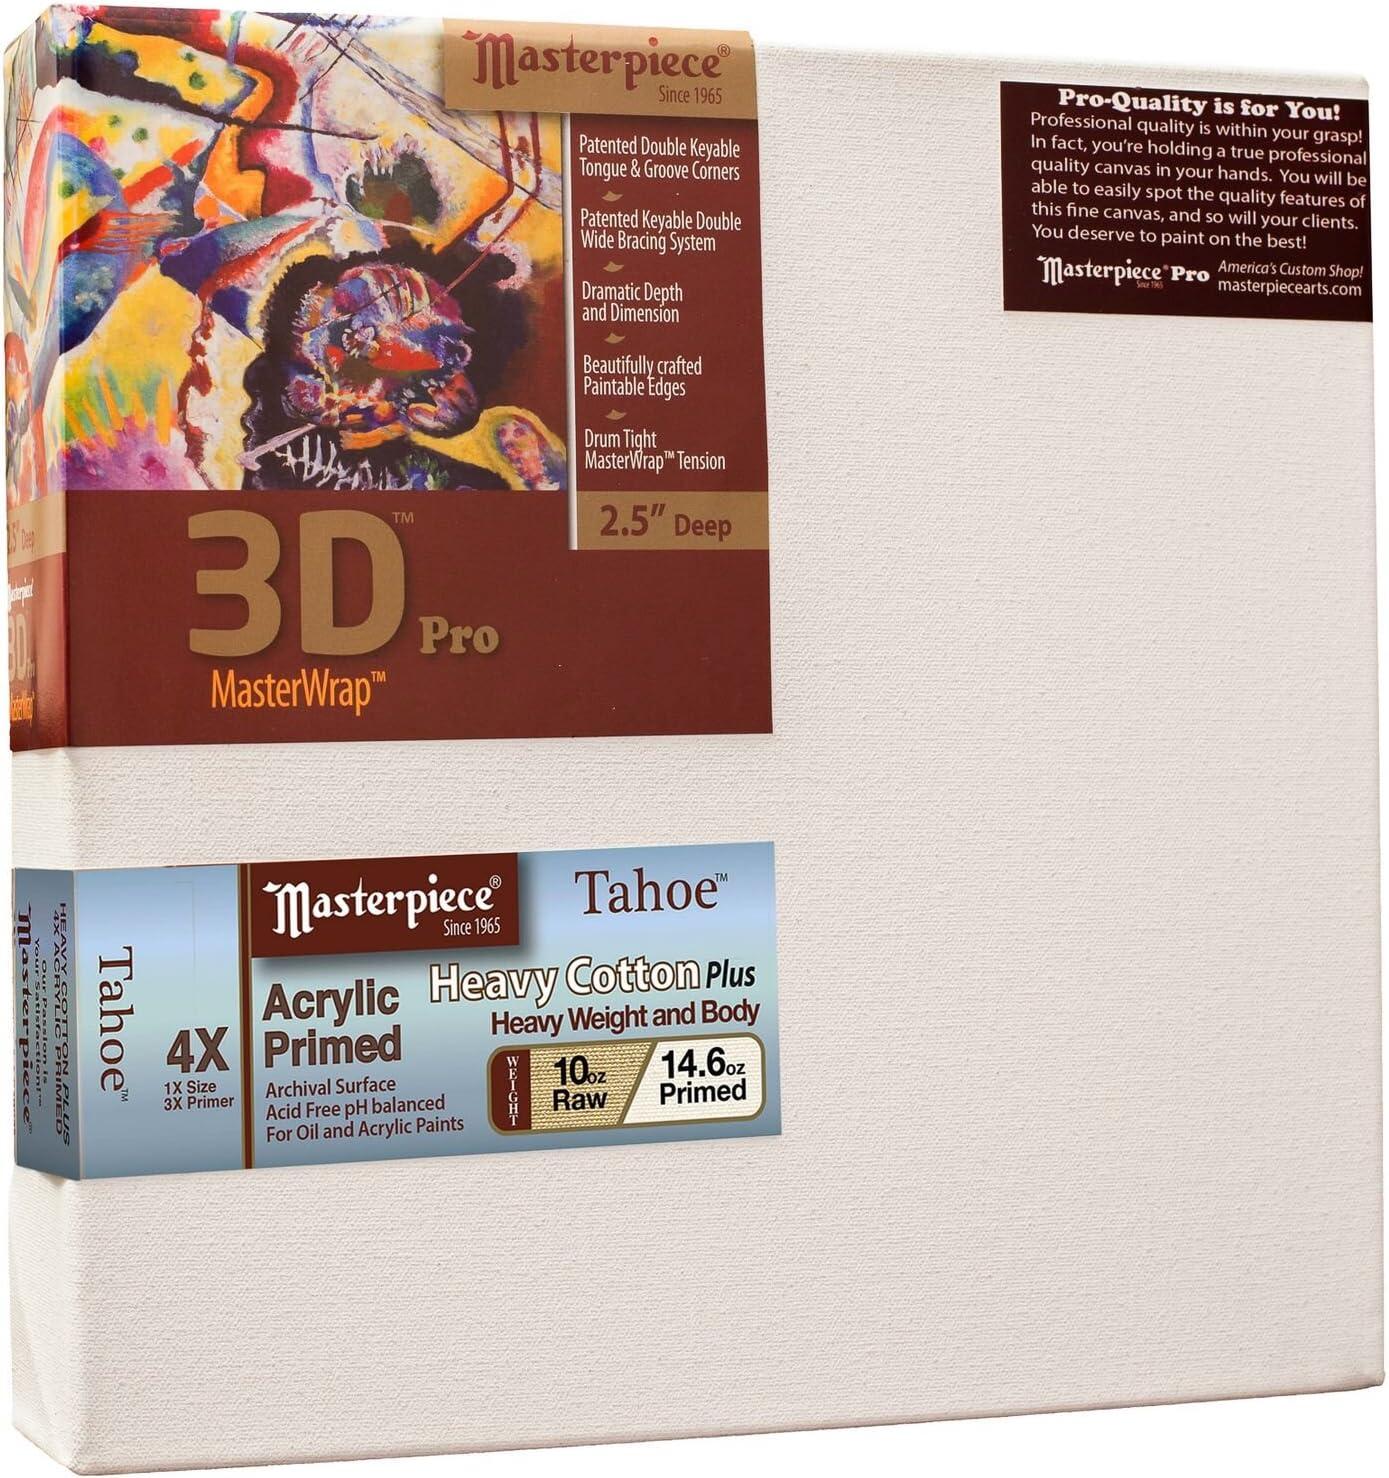 Masterpiece Artist Canvas Omaha Mall DT-6885 3D Pro x 68